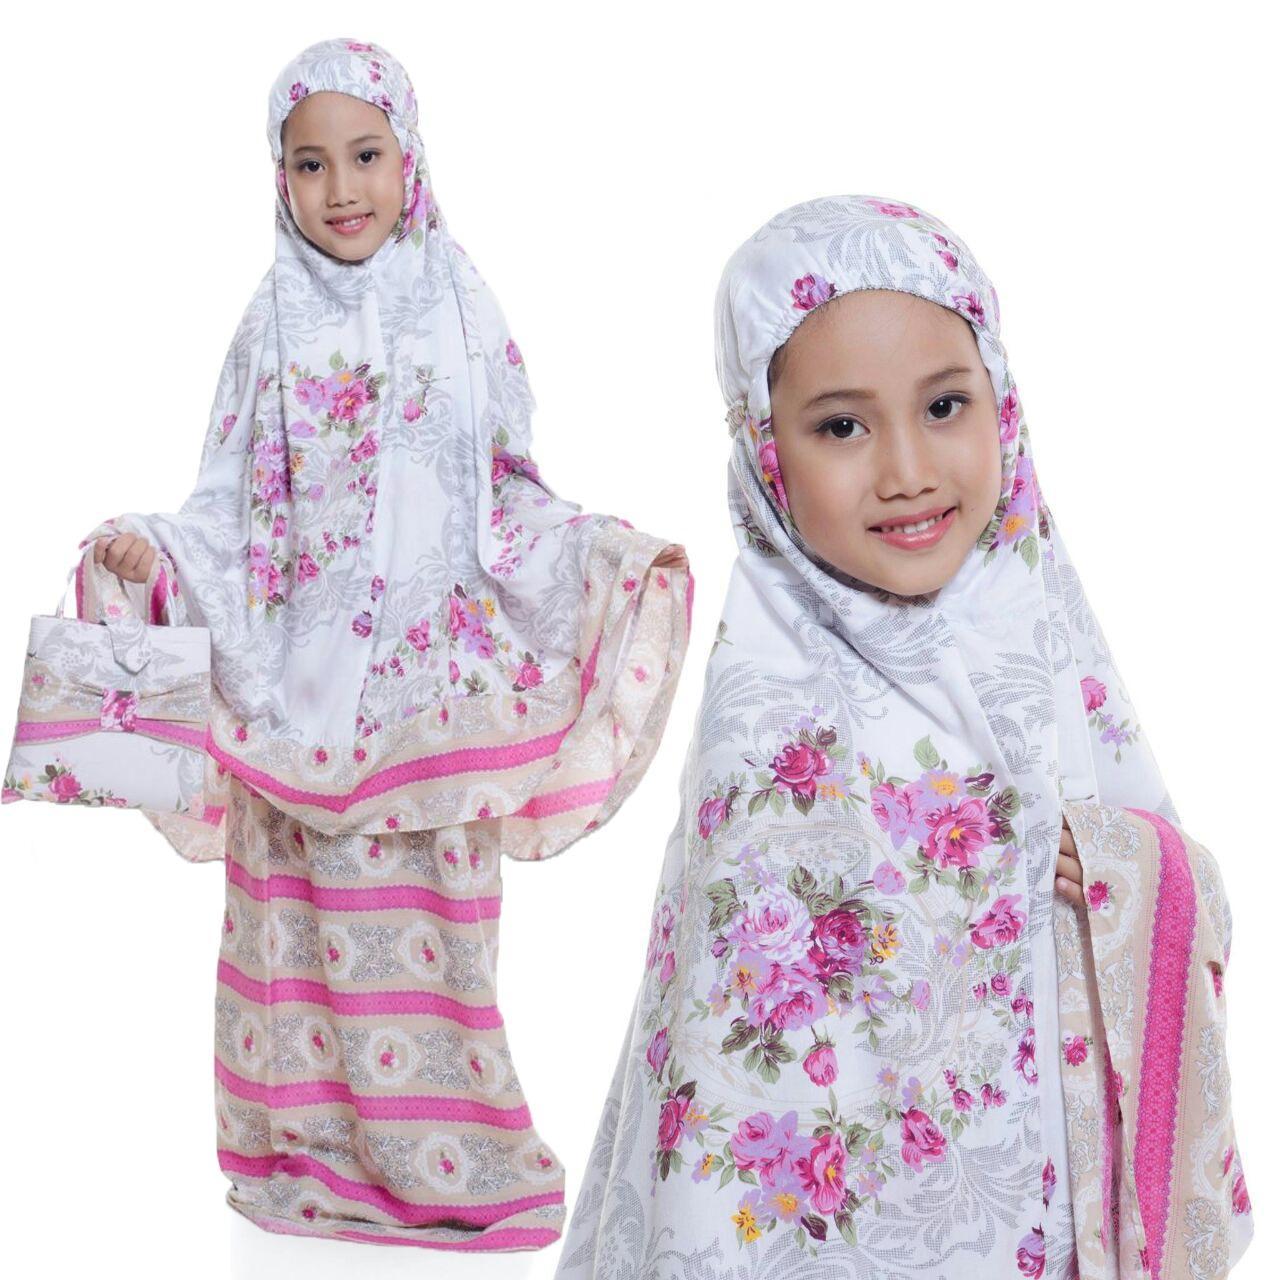 Grateful Fashion Setelan Mukena Anak Kalila Untuk 6 Tahun Sampai 8 Tahun - Coklat - Best Seller 3